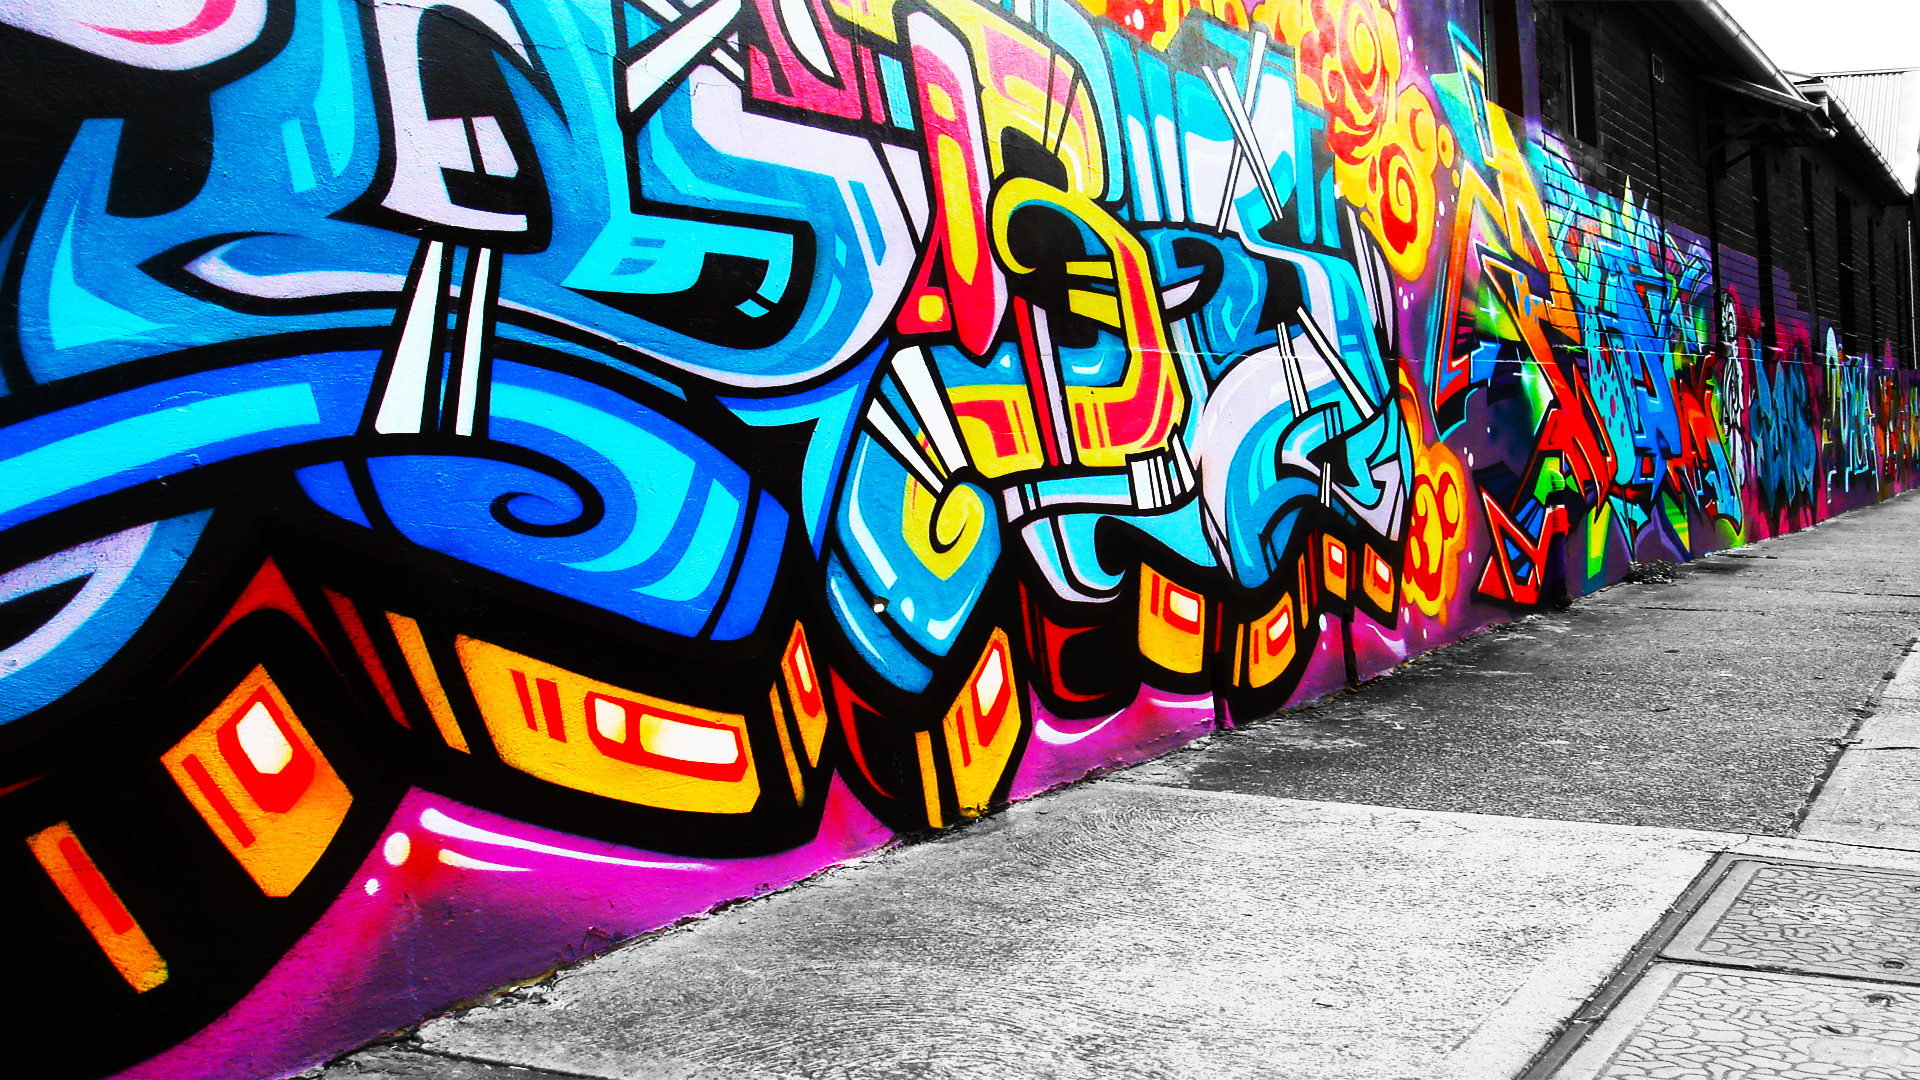 Graffiti art wallpaper - Home Digital Art Graffiti Background